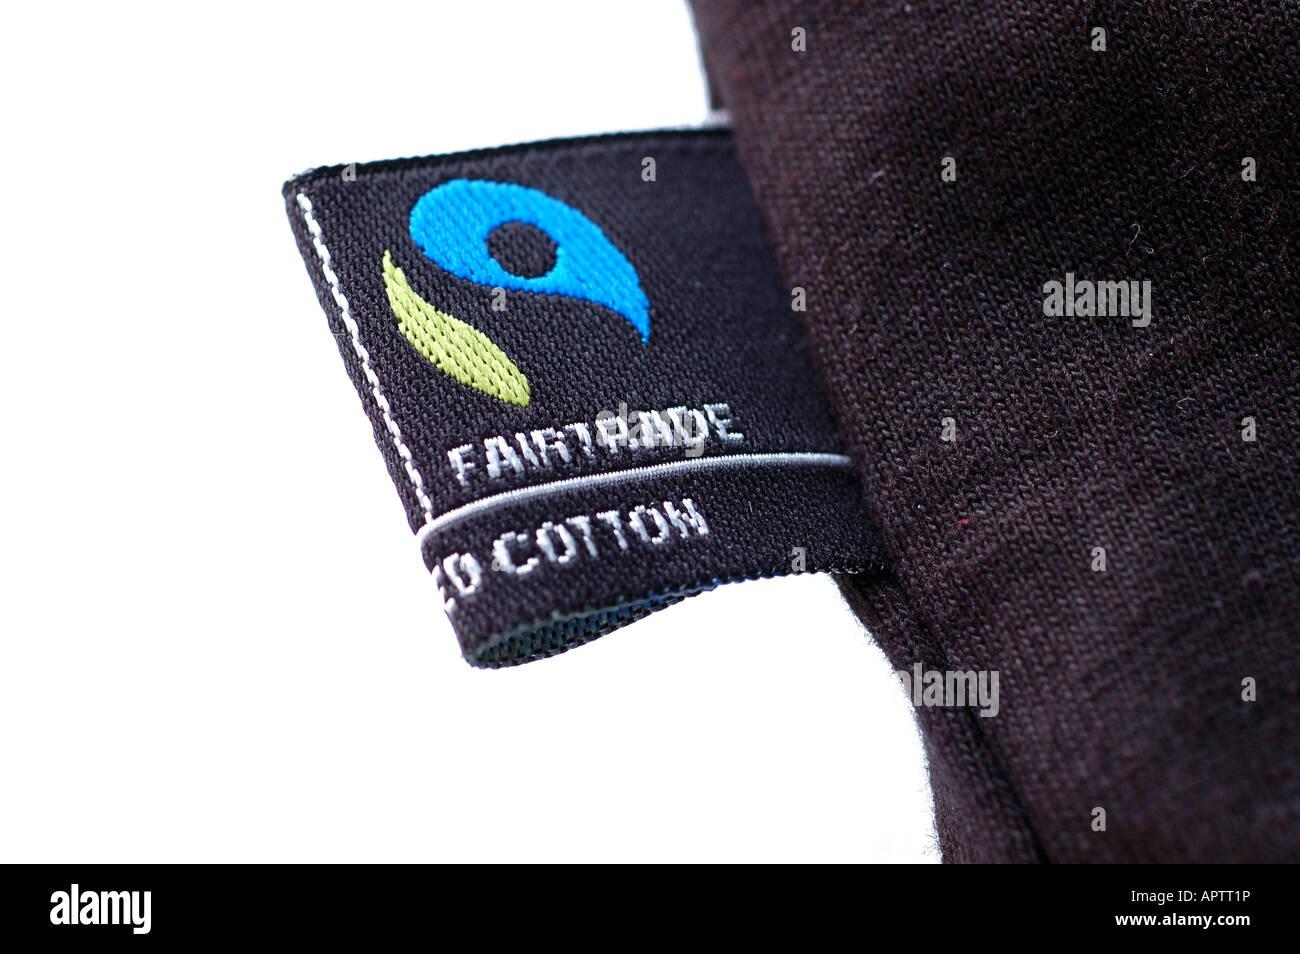 Fair Trade Clothing Logo On A Black T Shirt Stock Photo